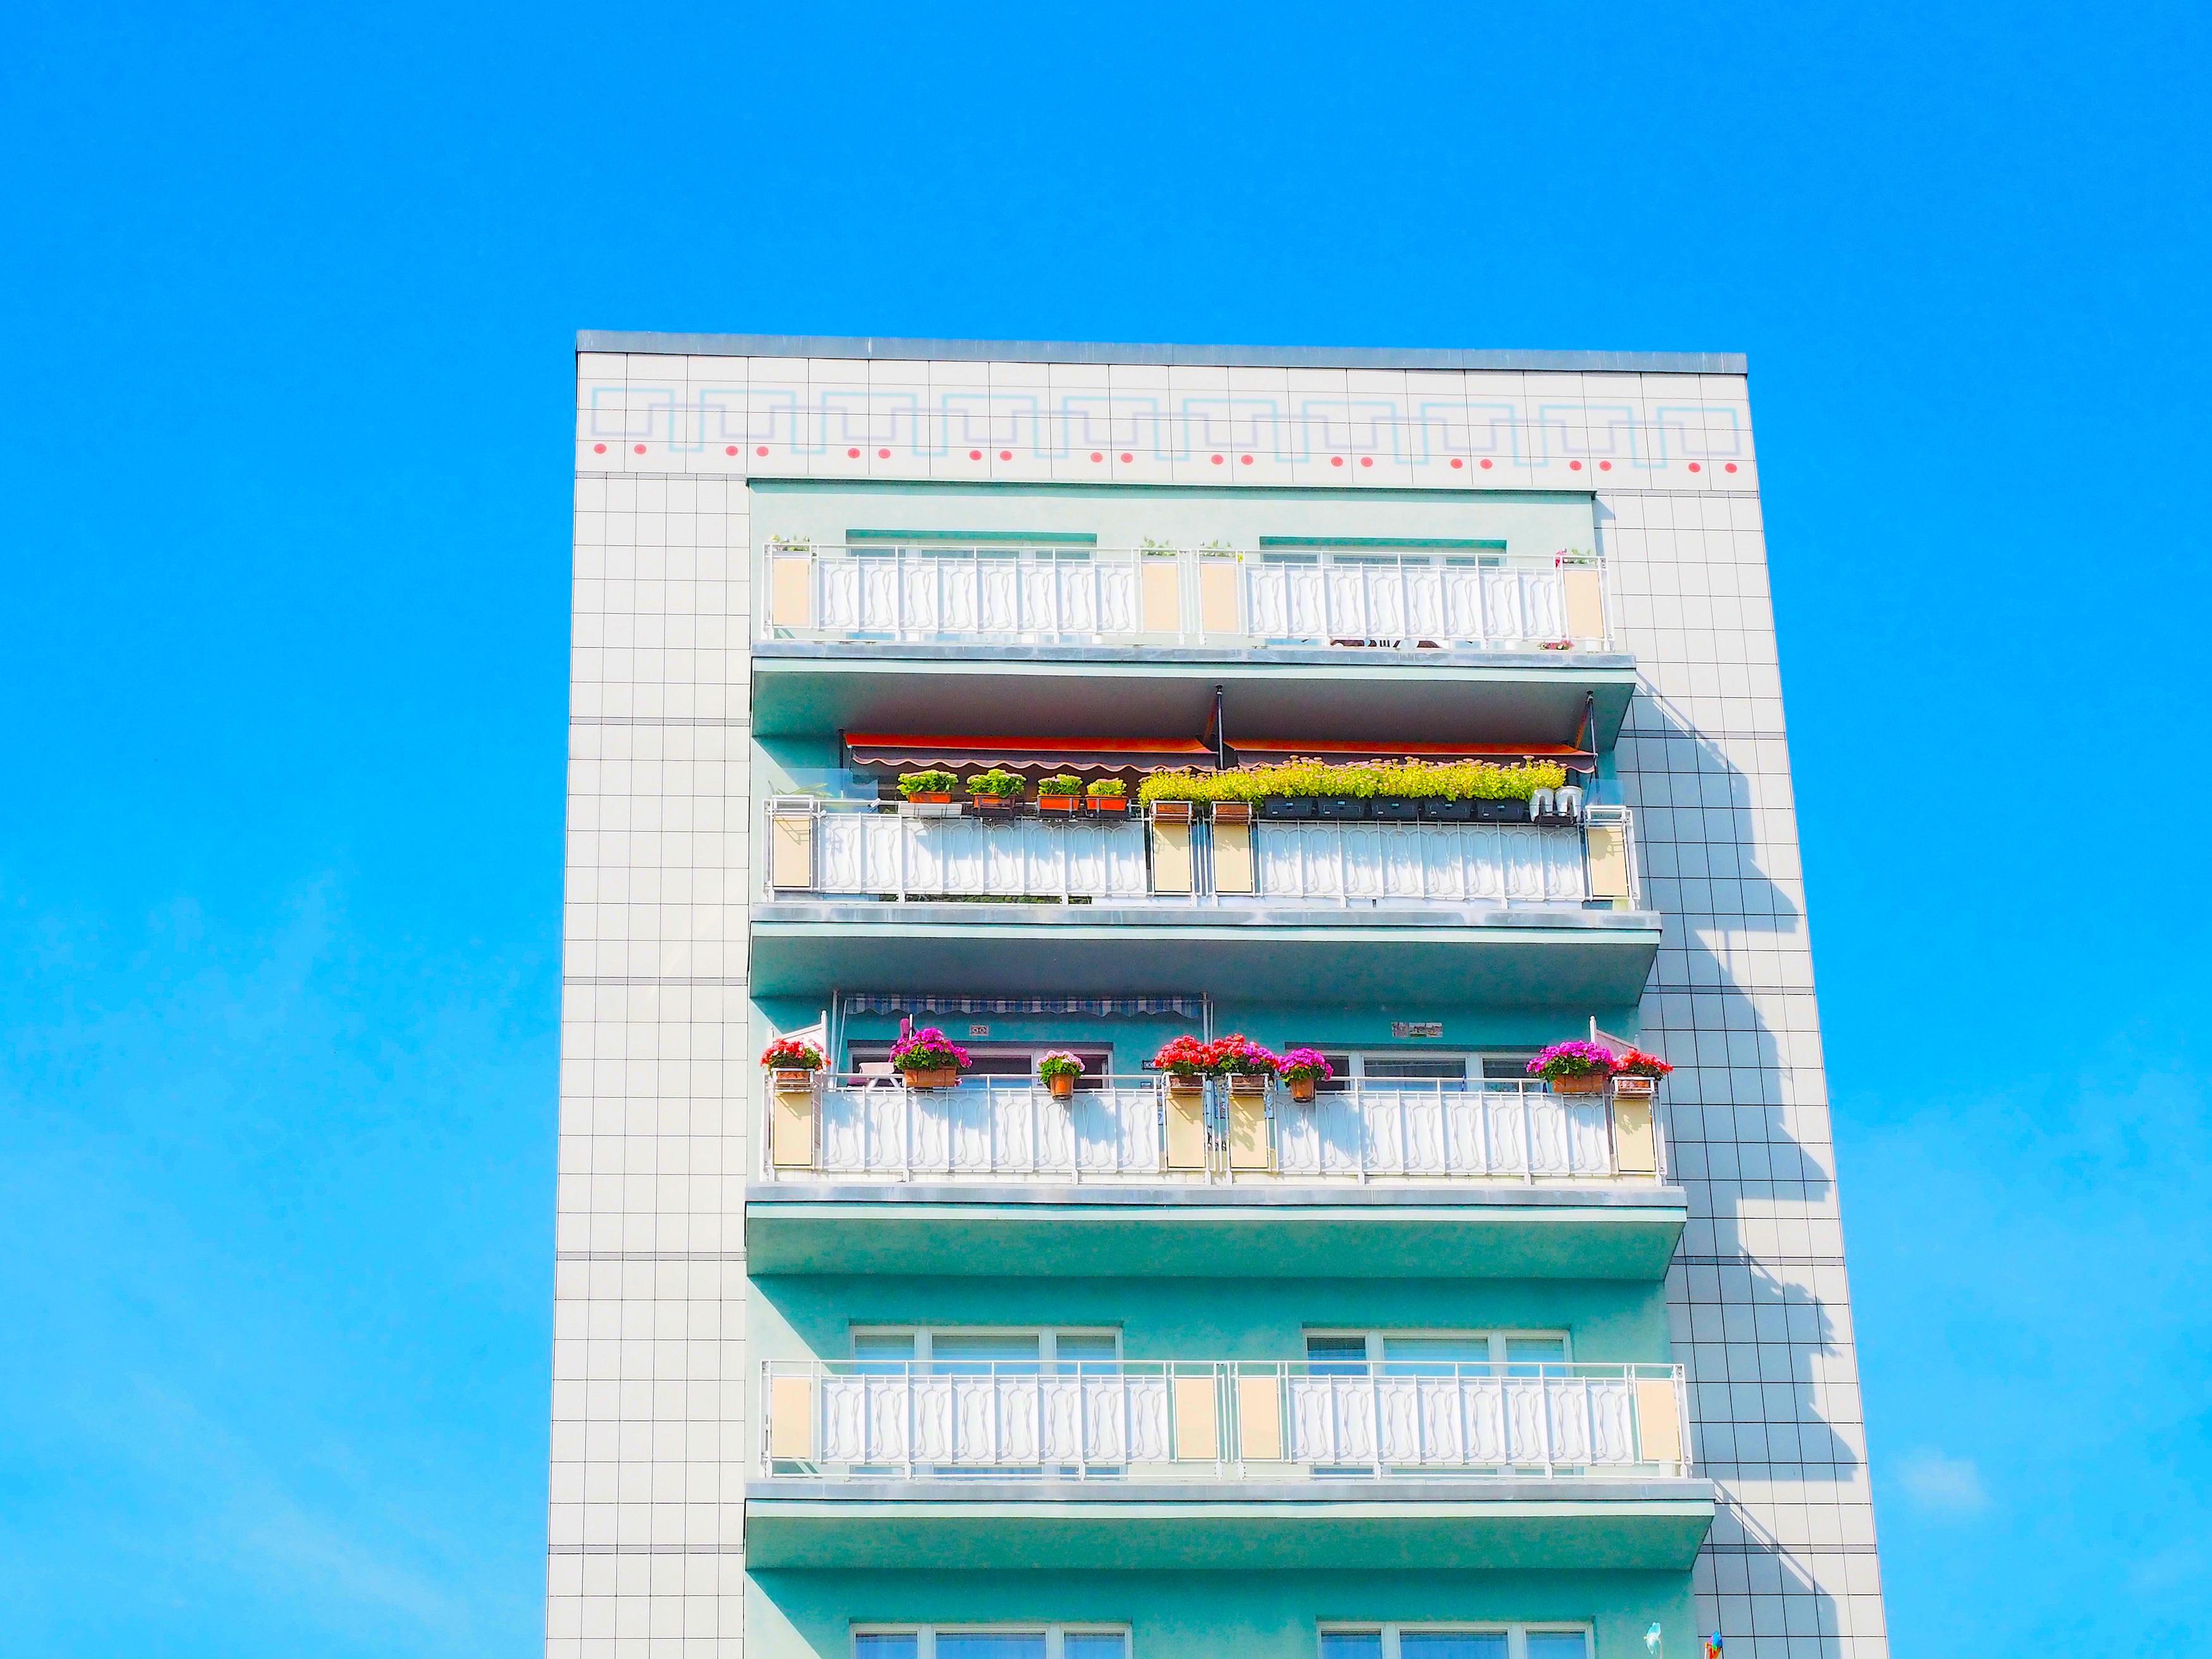 Holzmarktstraße, Berlin, Architektur